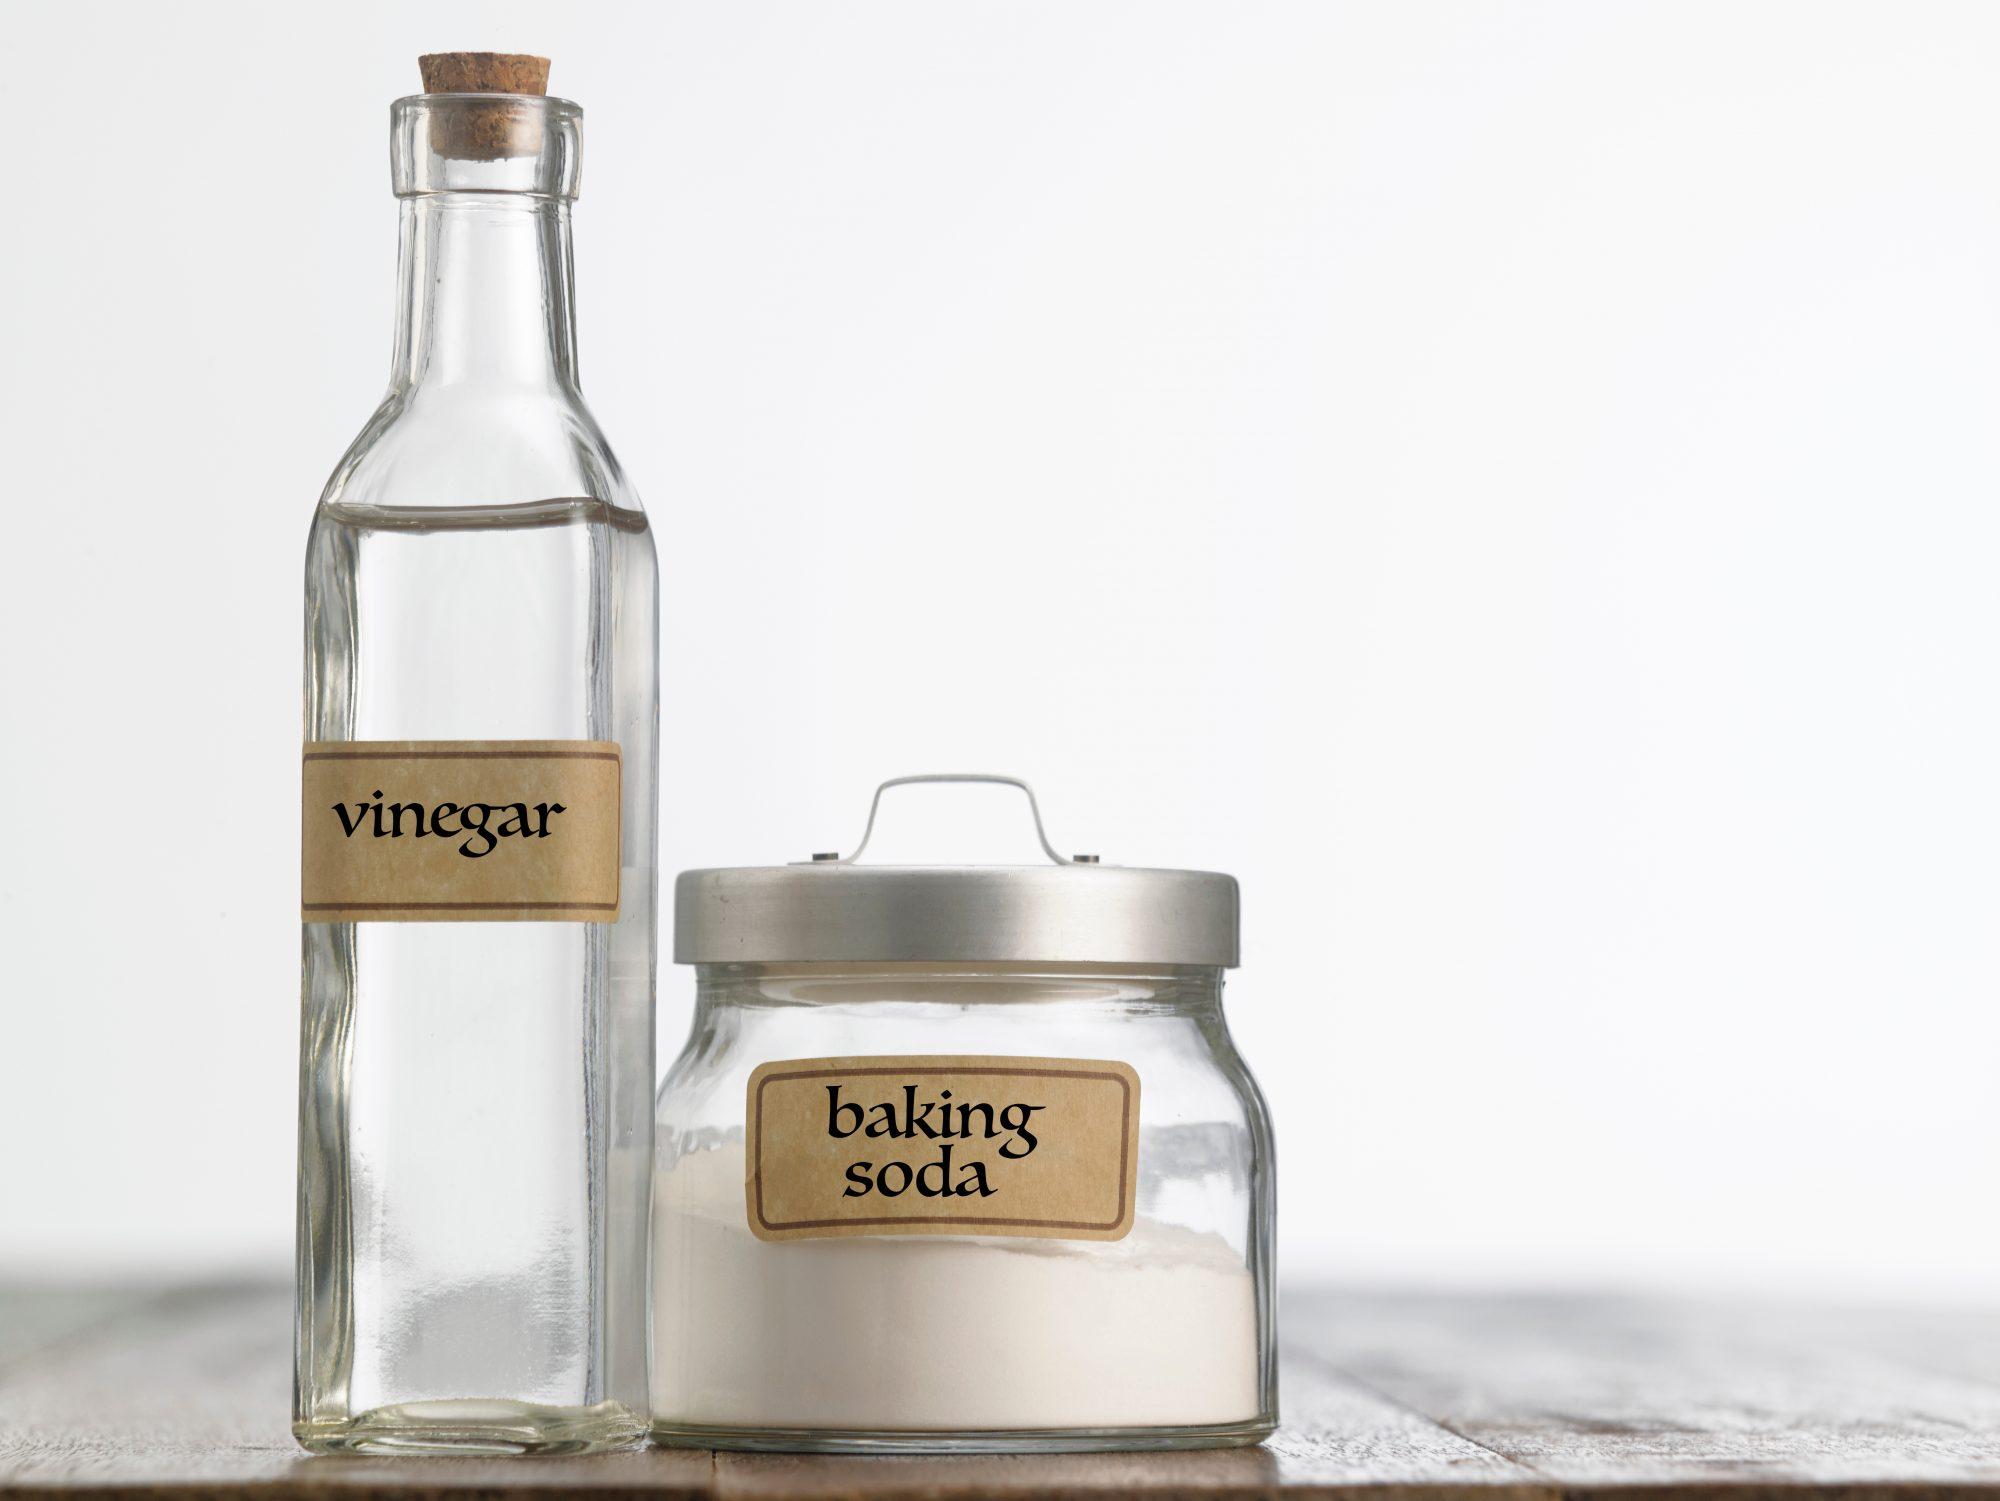 Vinegar and Baking Soda Getty 3/23/20